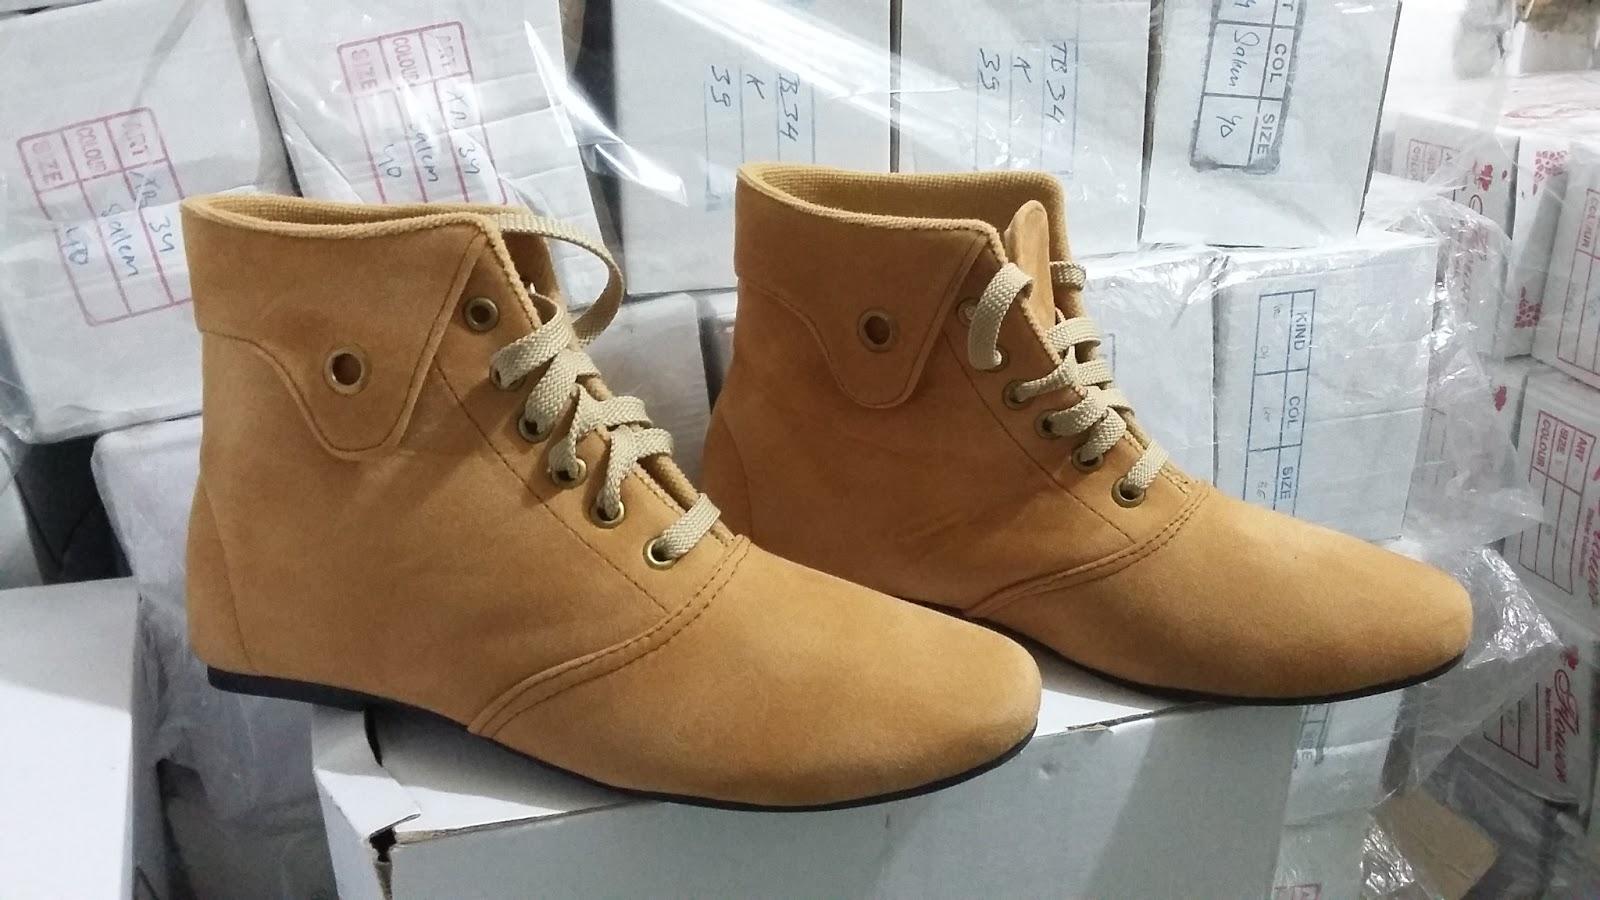 3e4884f9347 Sepatu Boots Korean Style Murah Berkualitas Kode BT1